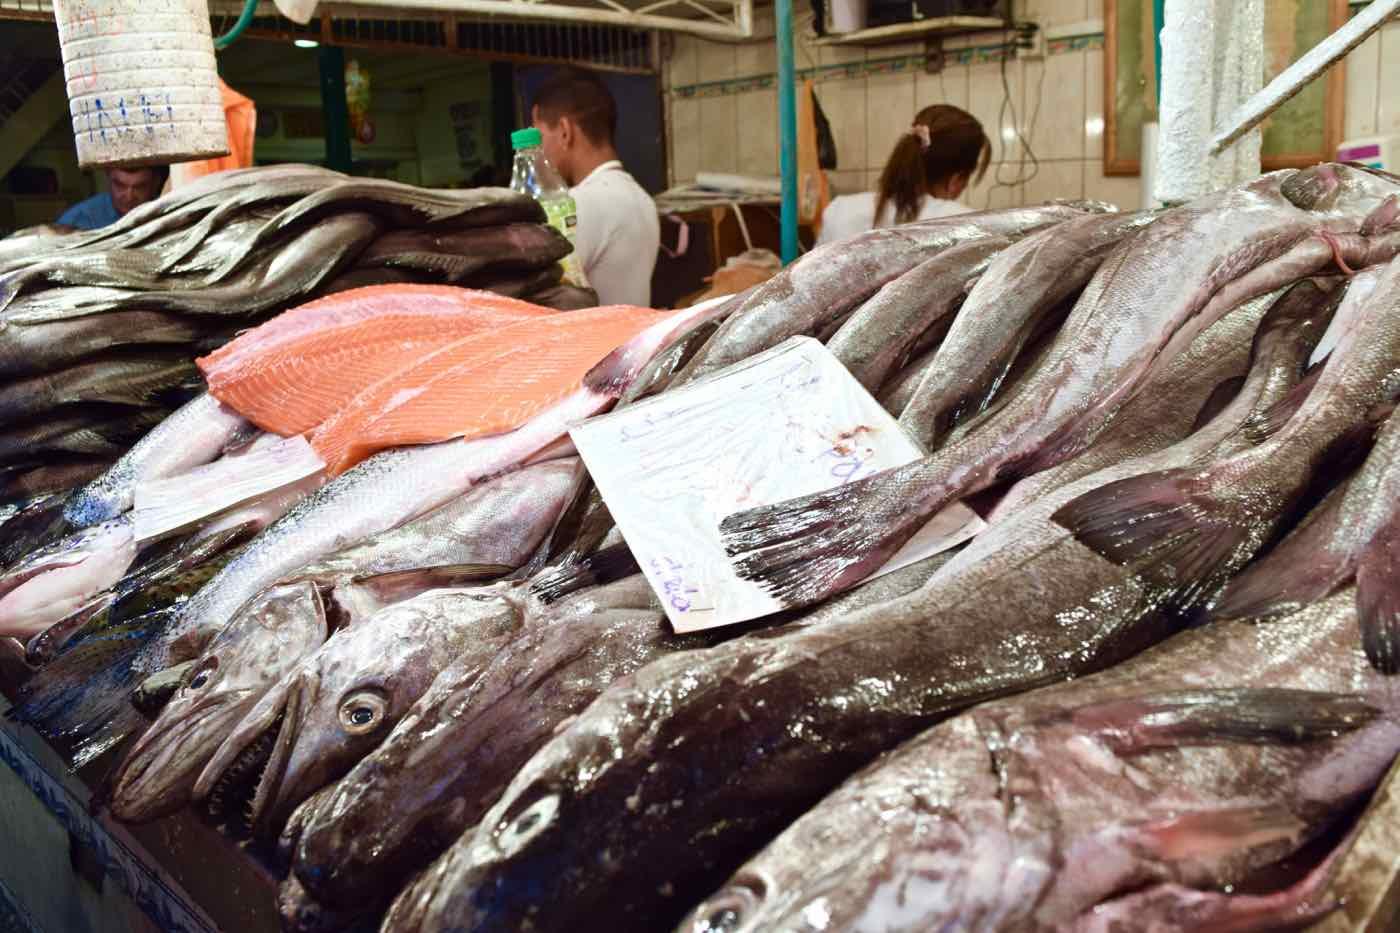 Fish for sale in Mercado Central, Santiago, Chile